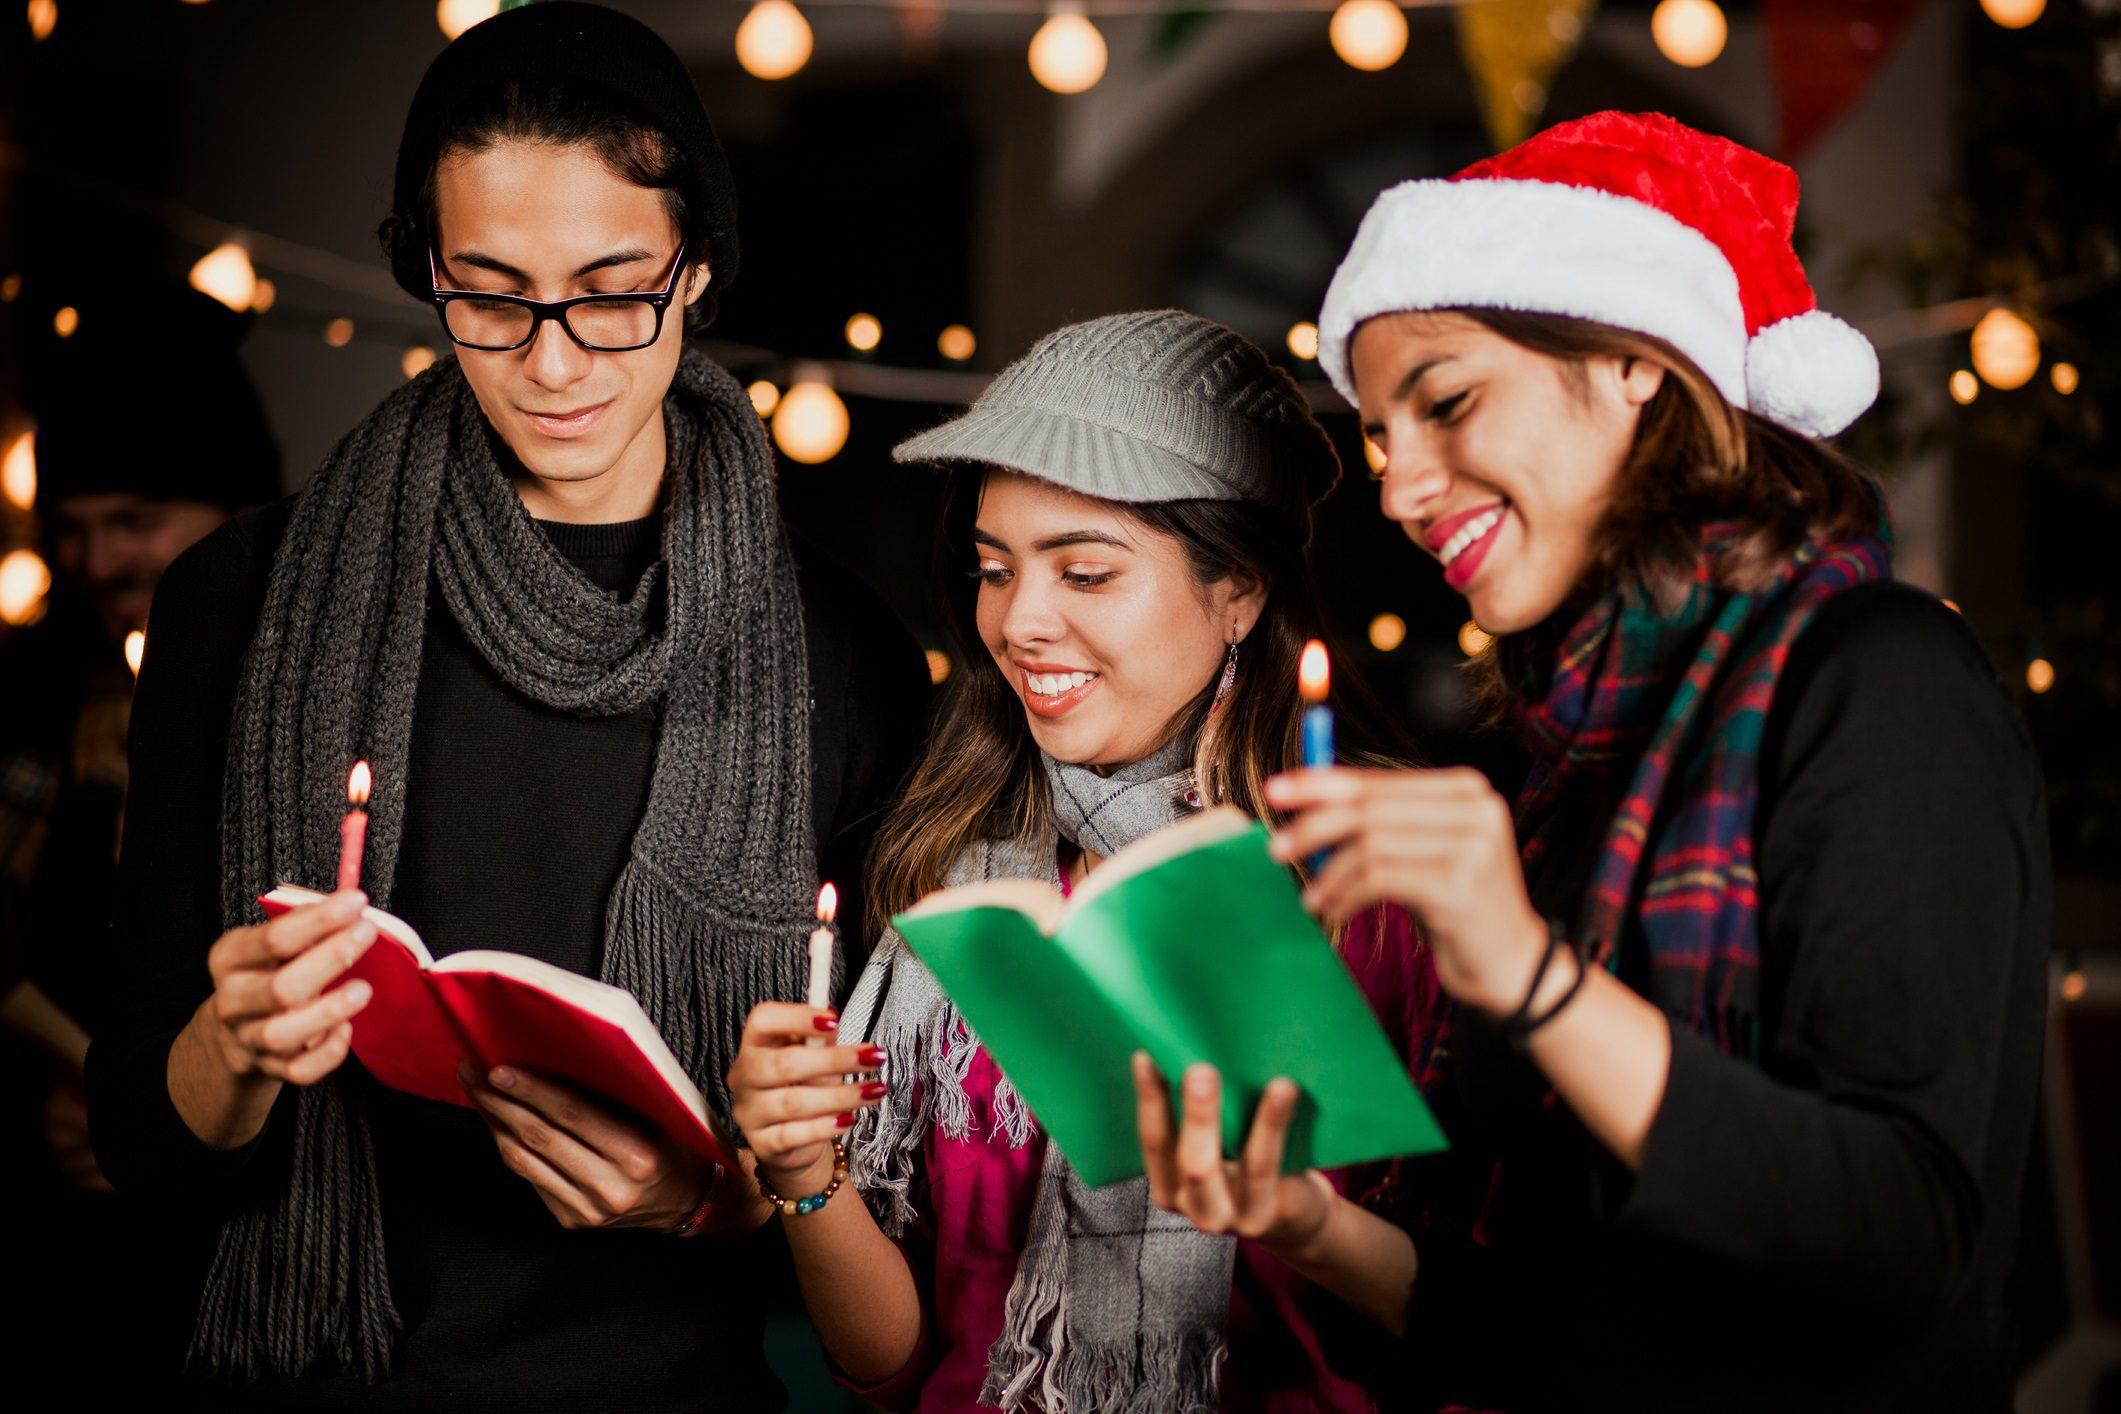 Carolers, candles, book, christmas lights